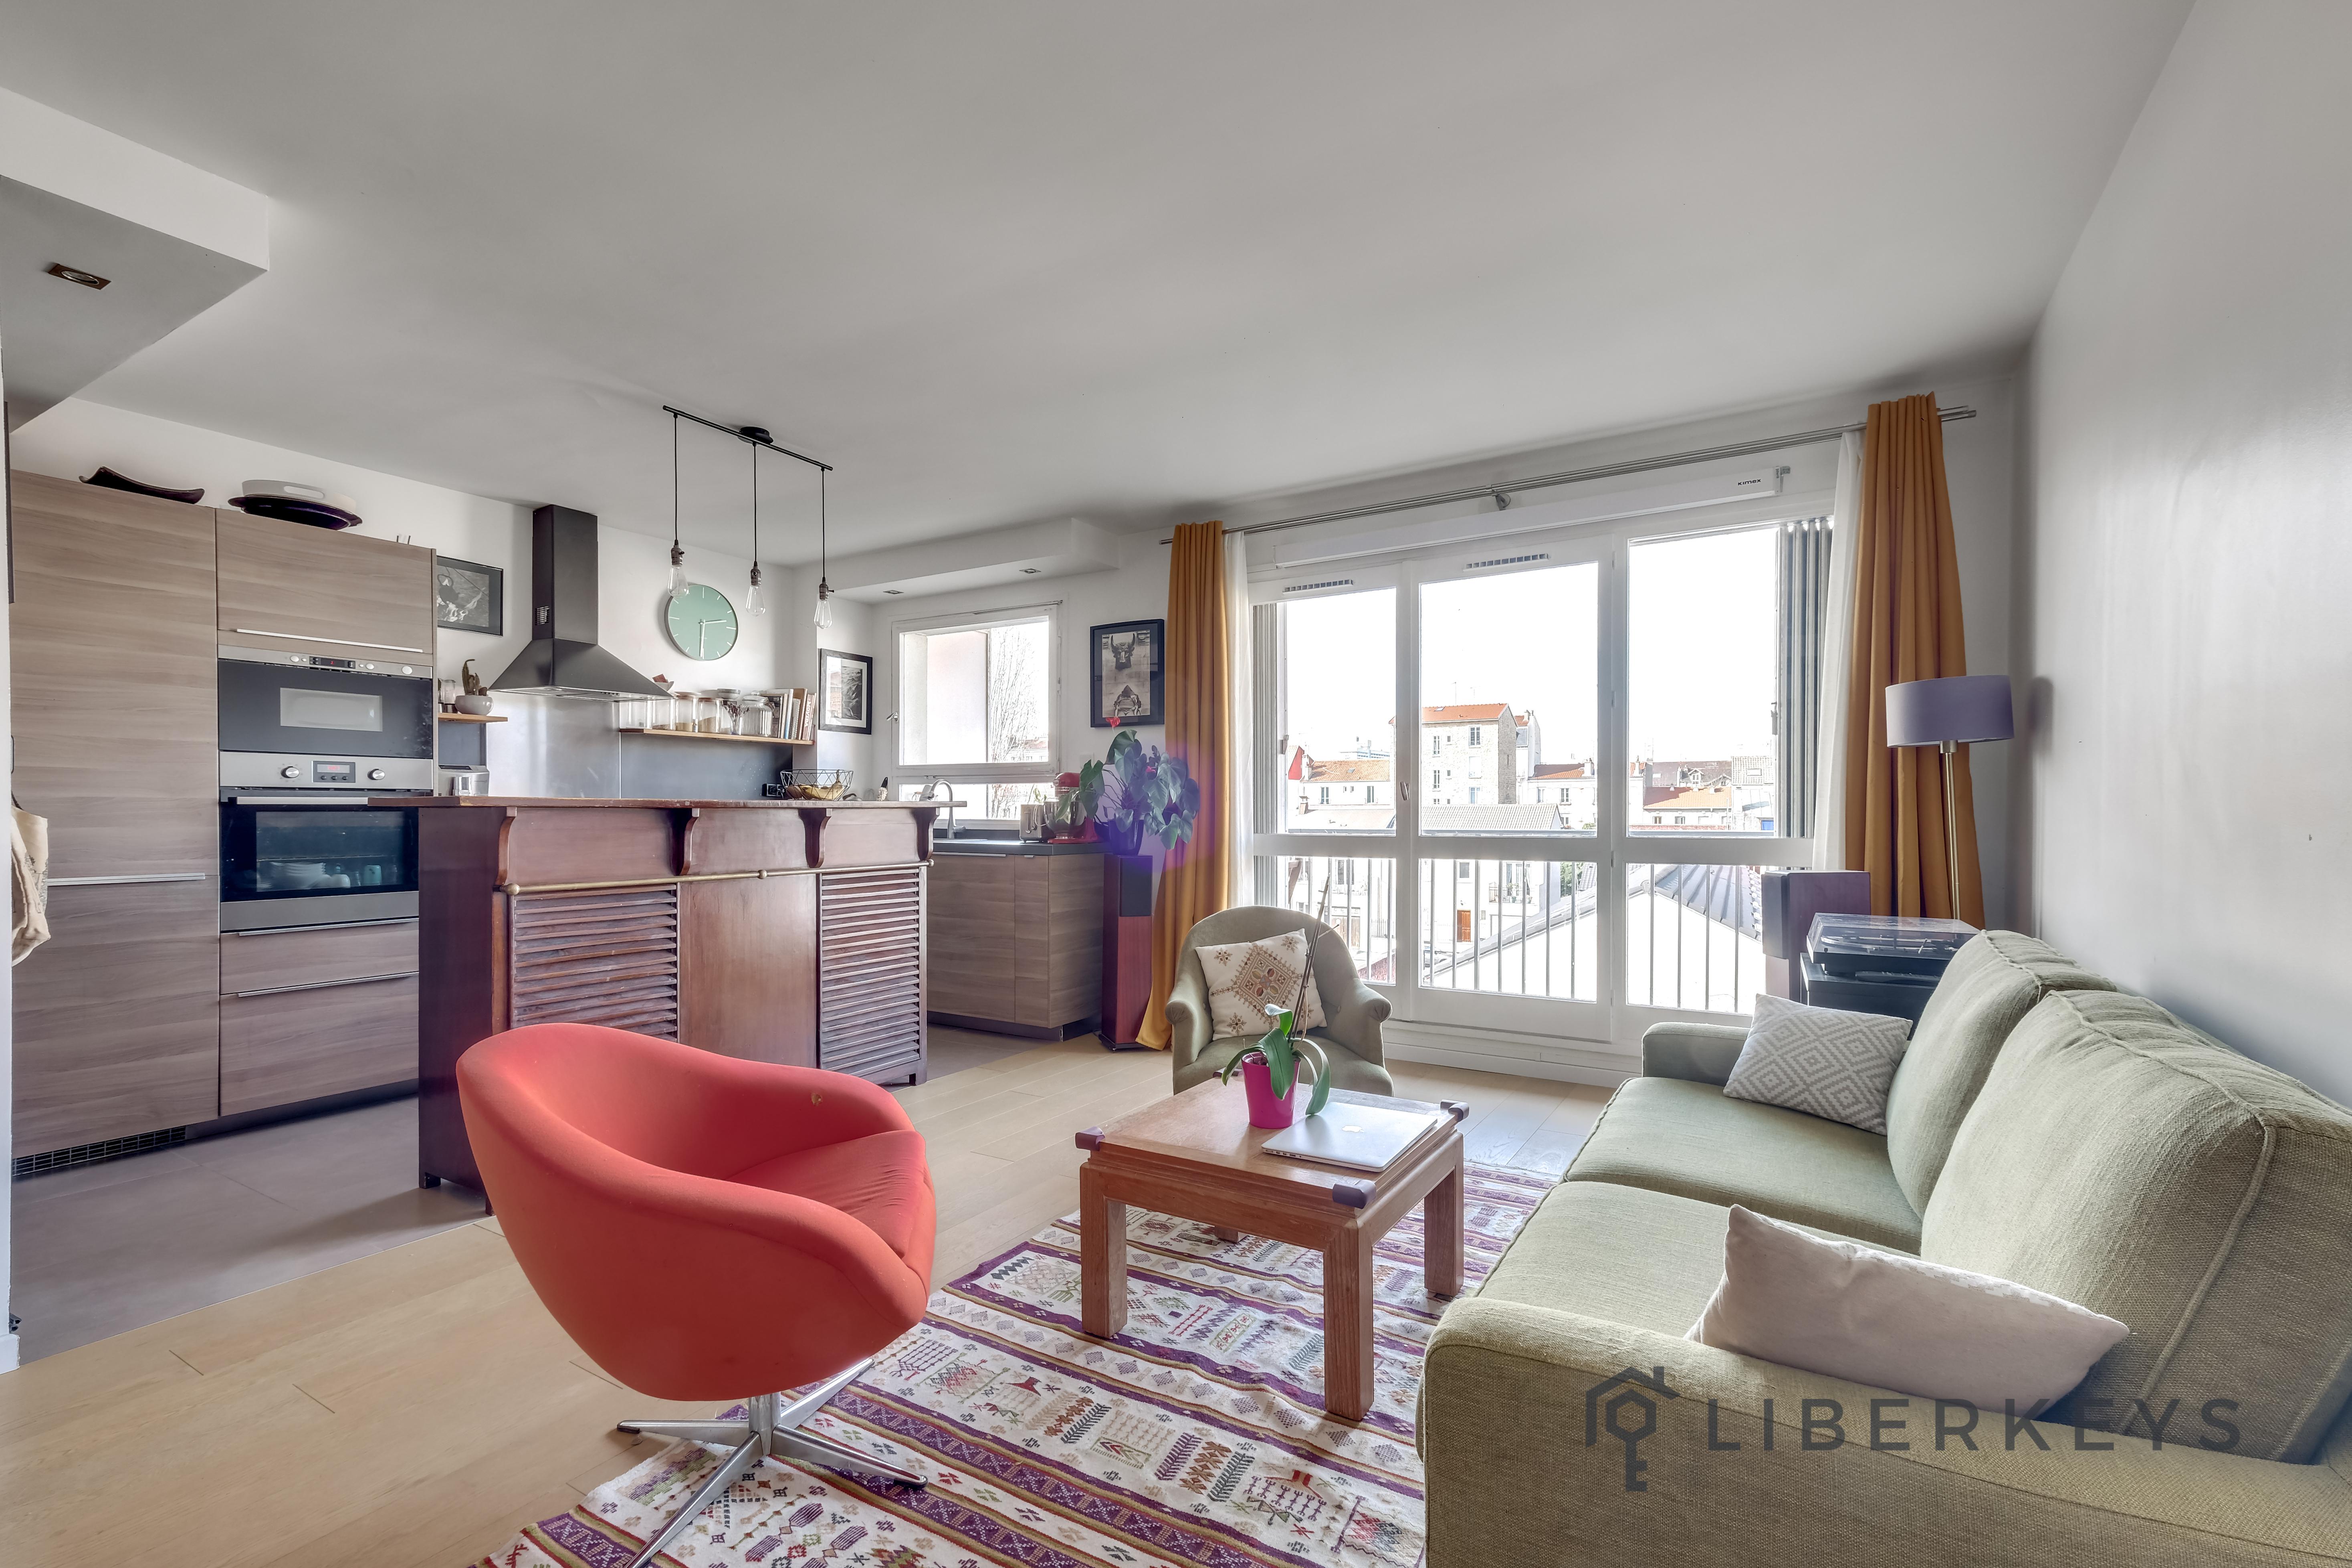 vente appartement 3 pi ces 65m 94200 ivry sur seine liberkeys. Black Bedroom Furniture Sets. Home Design Ideas